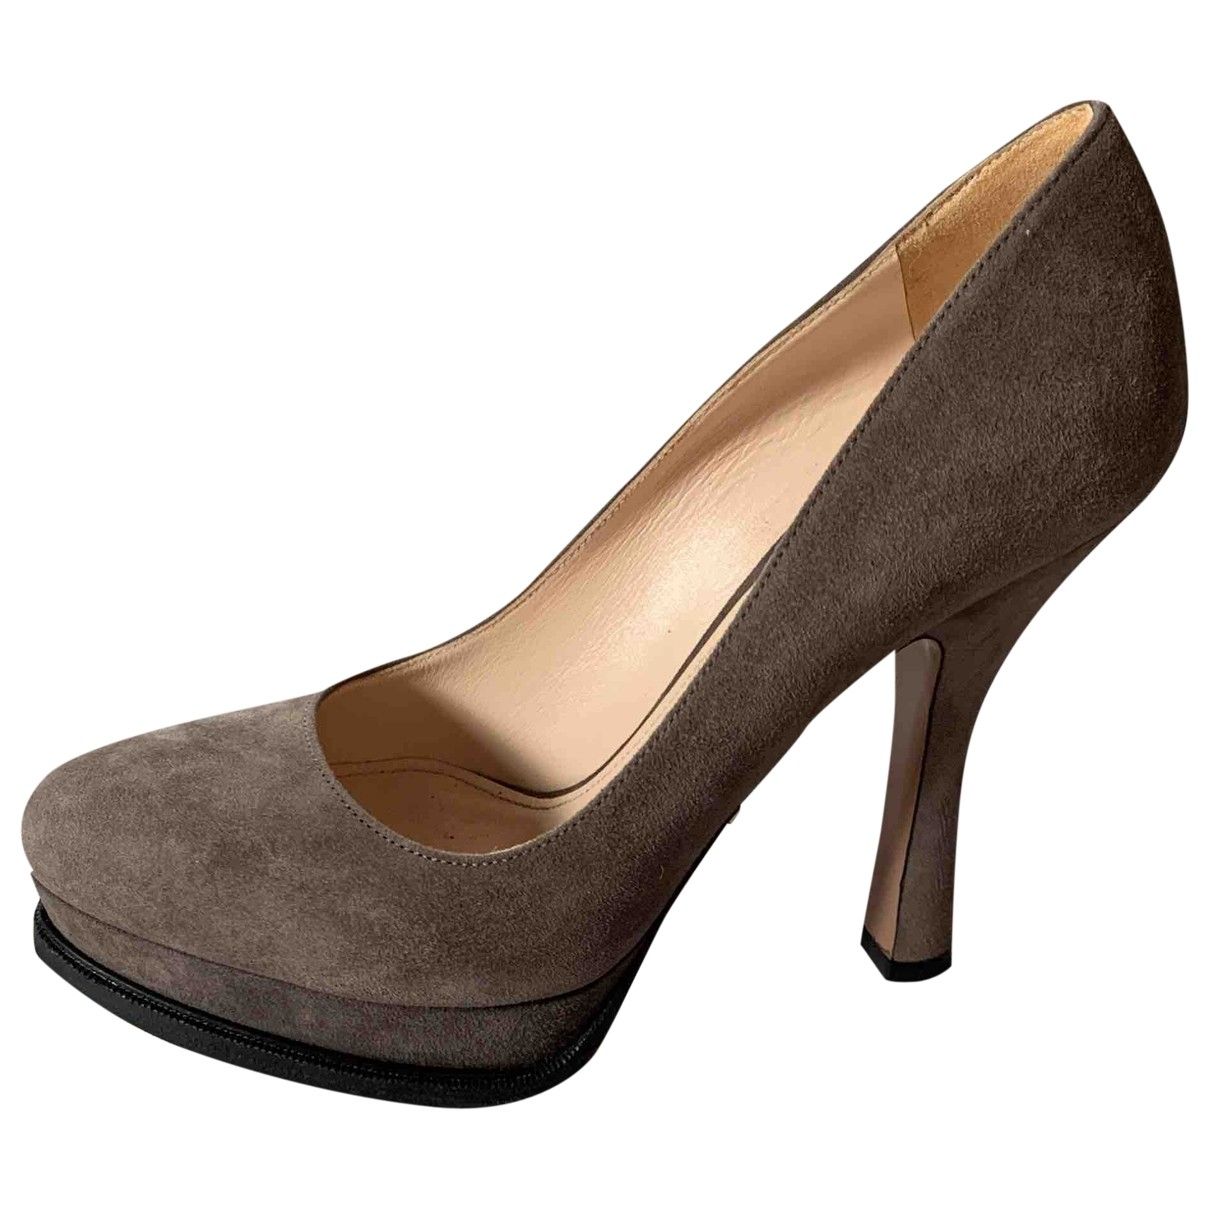 Prada \N Beige Suede Heels for Women 37.5 EU